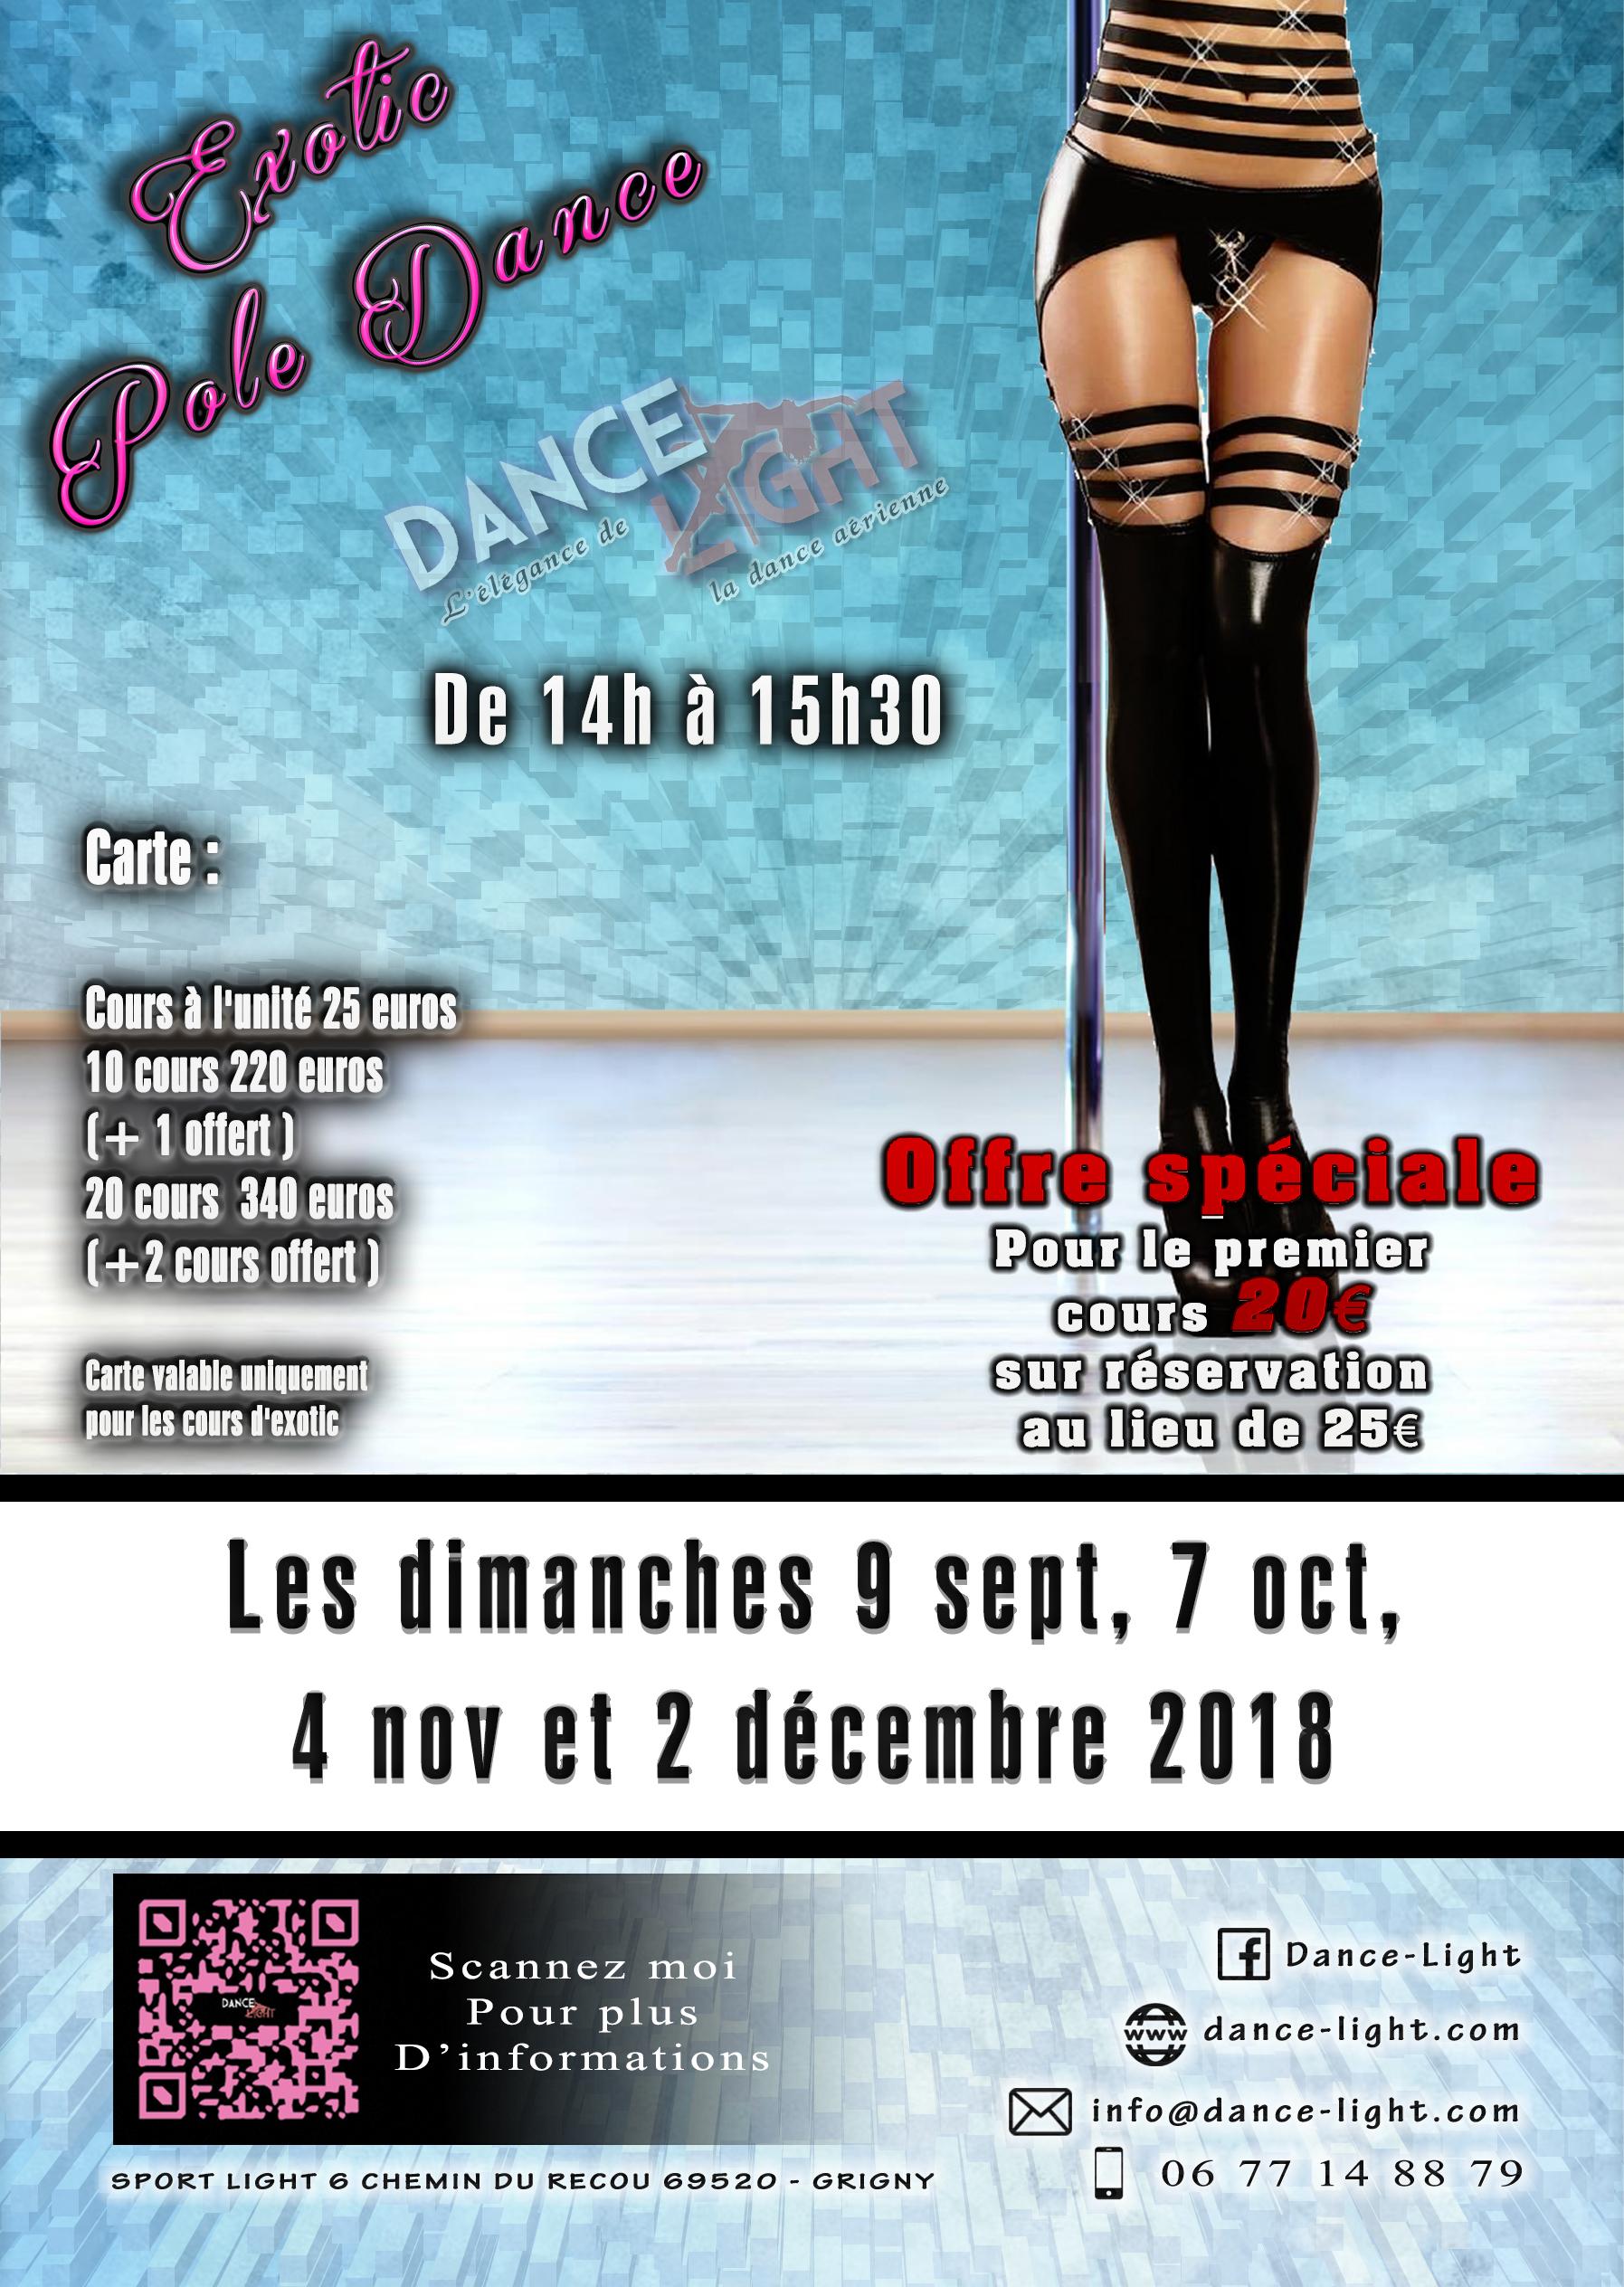 Exotic Pole Dance sept a dec 2018 new